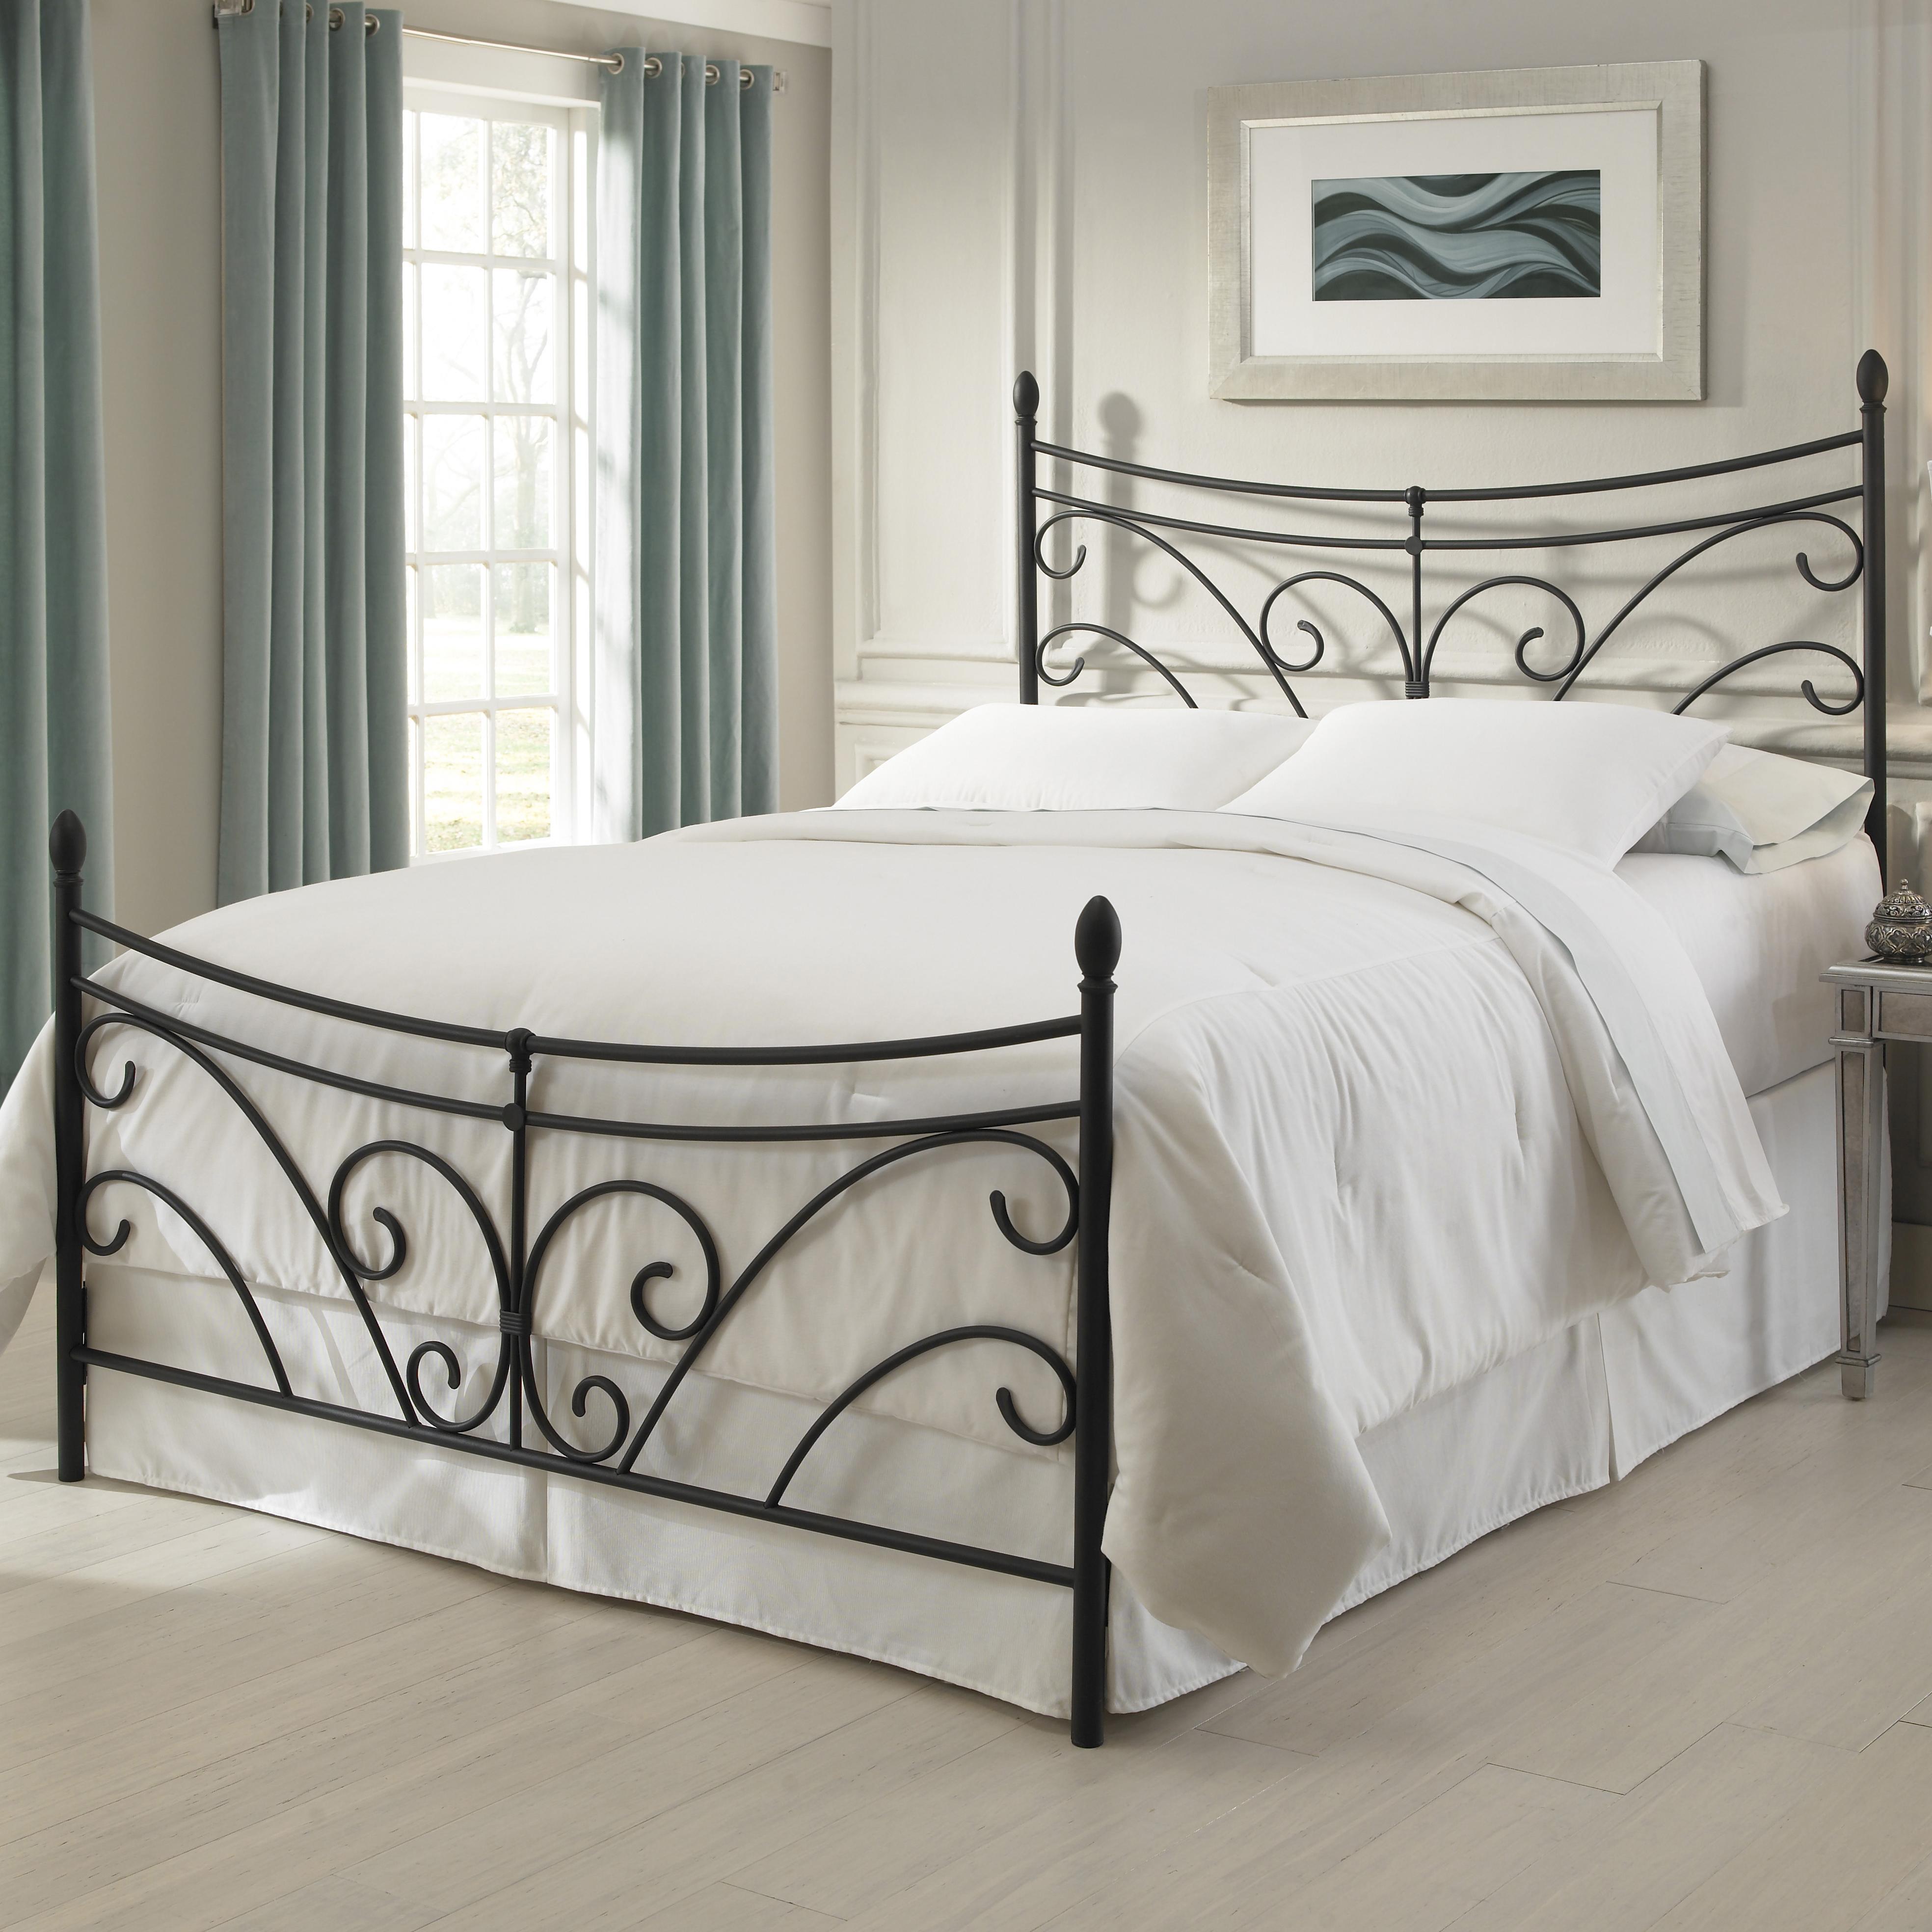 fashion bed group metal beds queen bergen bed w frame ahfa headboard footboard dealer locator - Iron Bed Frames Queen